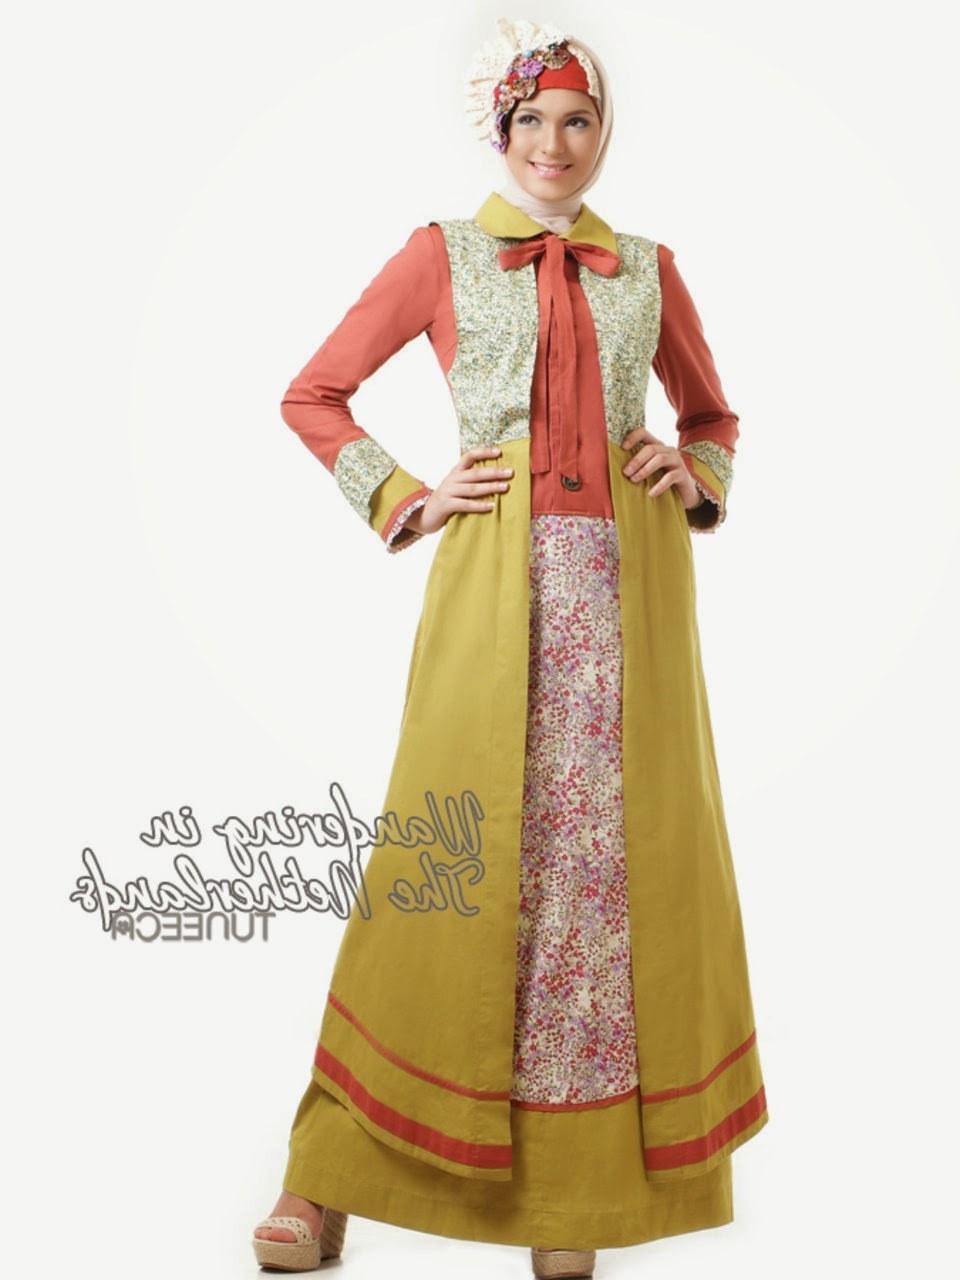 Ide Baju Lebaran Untuk Wanita 0gdr 12 Contoh Model Gamis Muslim Lebaran Terbaru Kumpulan